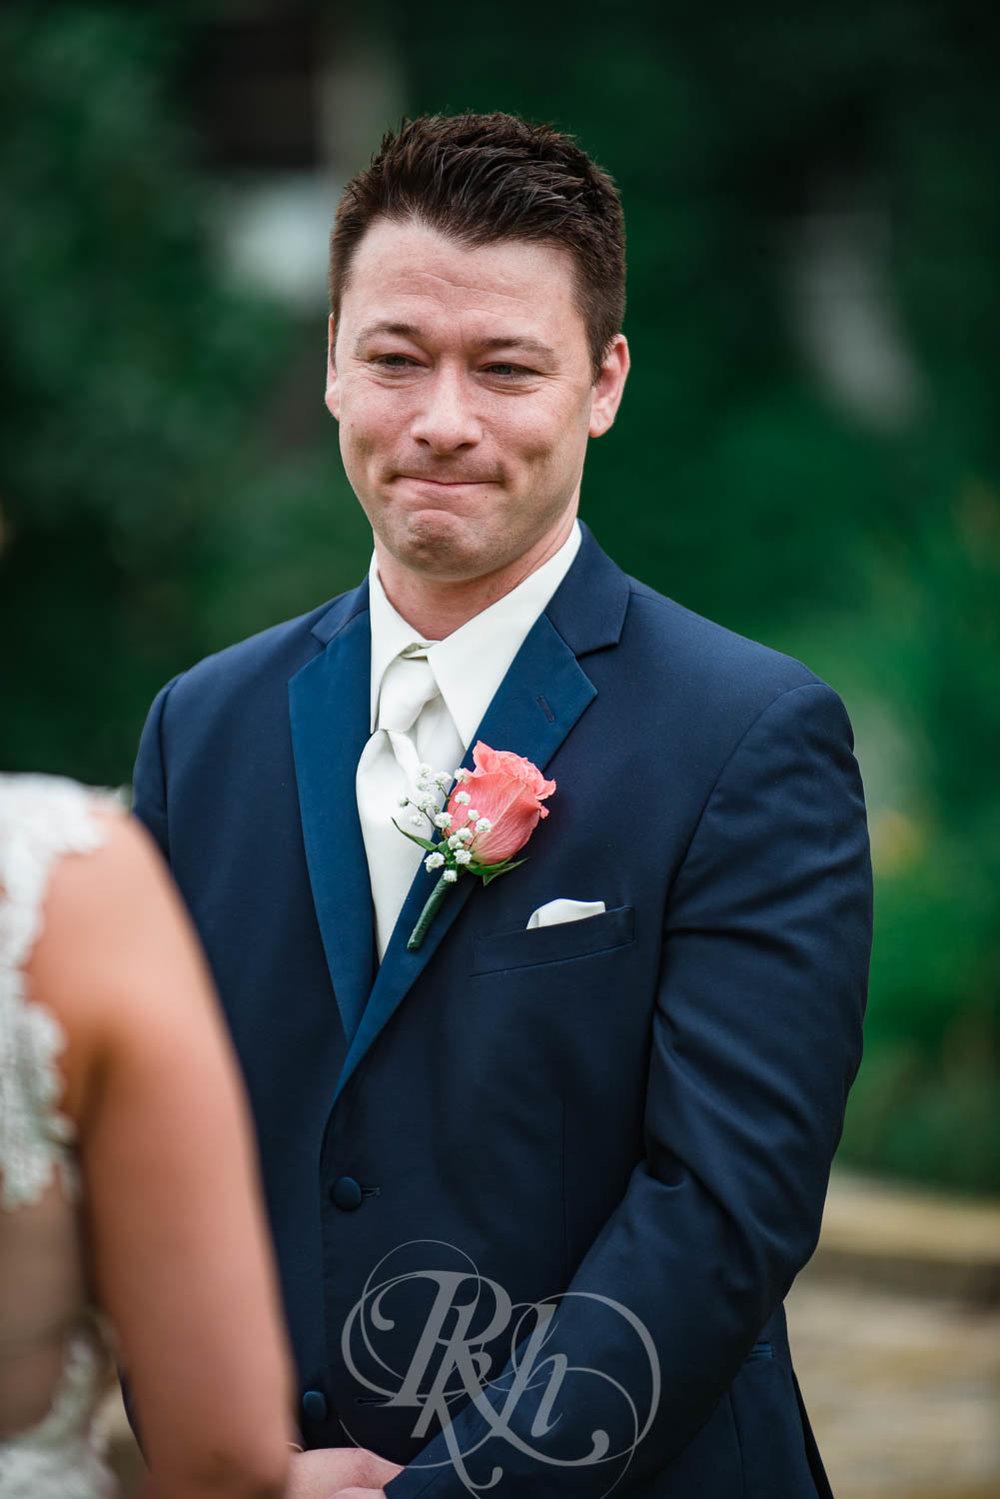 Jackie & Jan - Mankato Wedding Photography - Hubbard House - RKH Images - Blog  (8 of 22).jpg